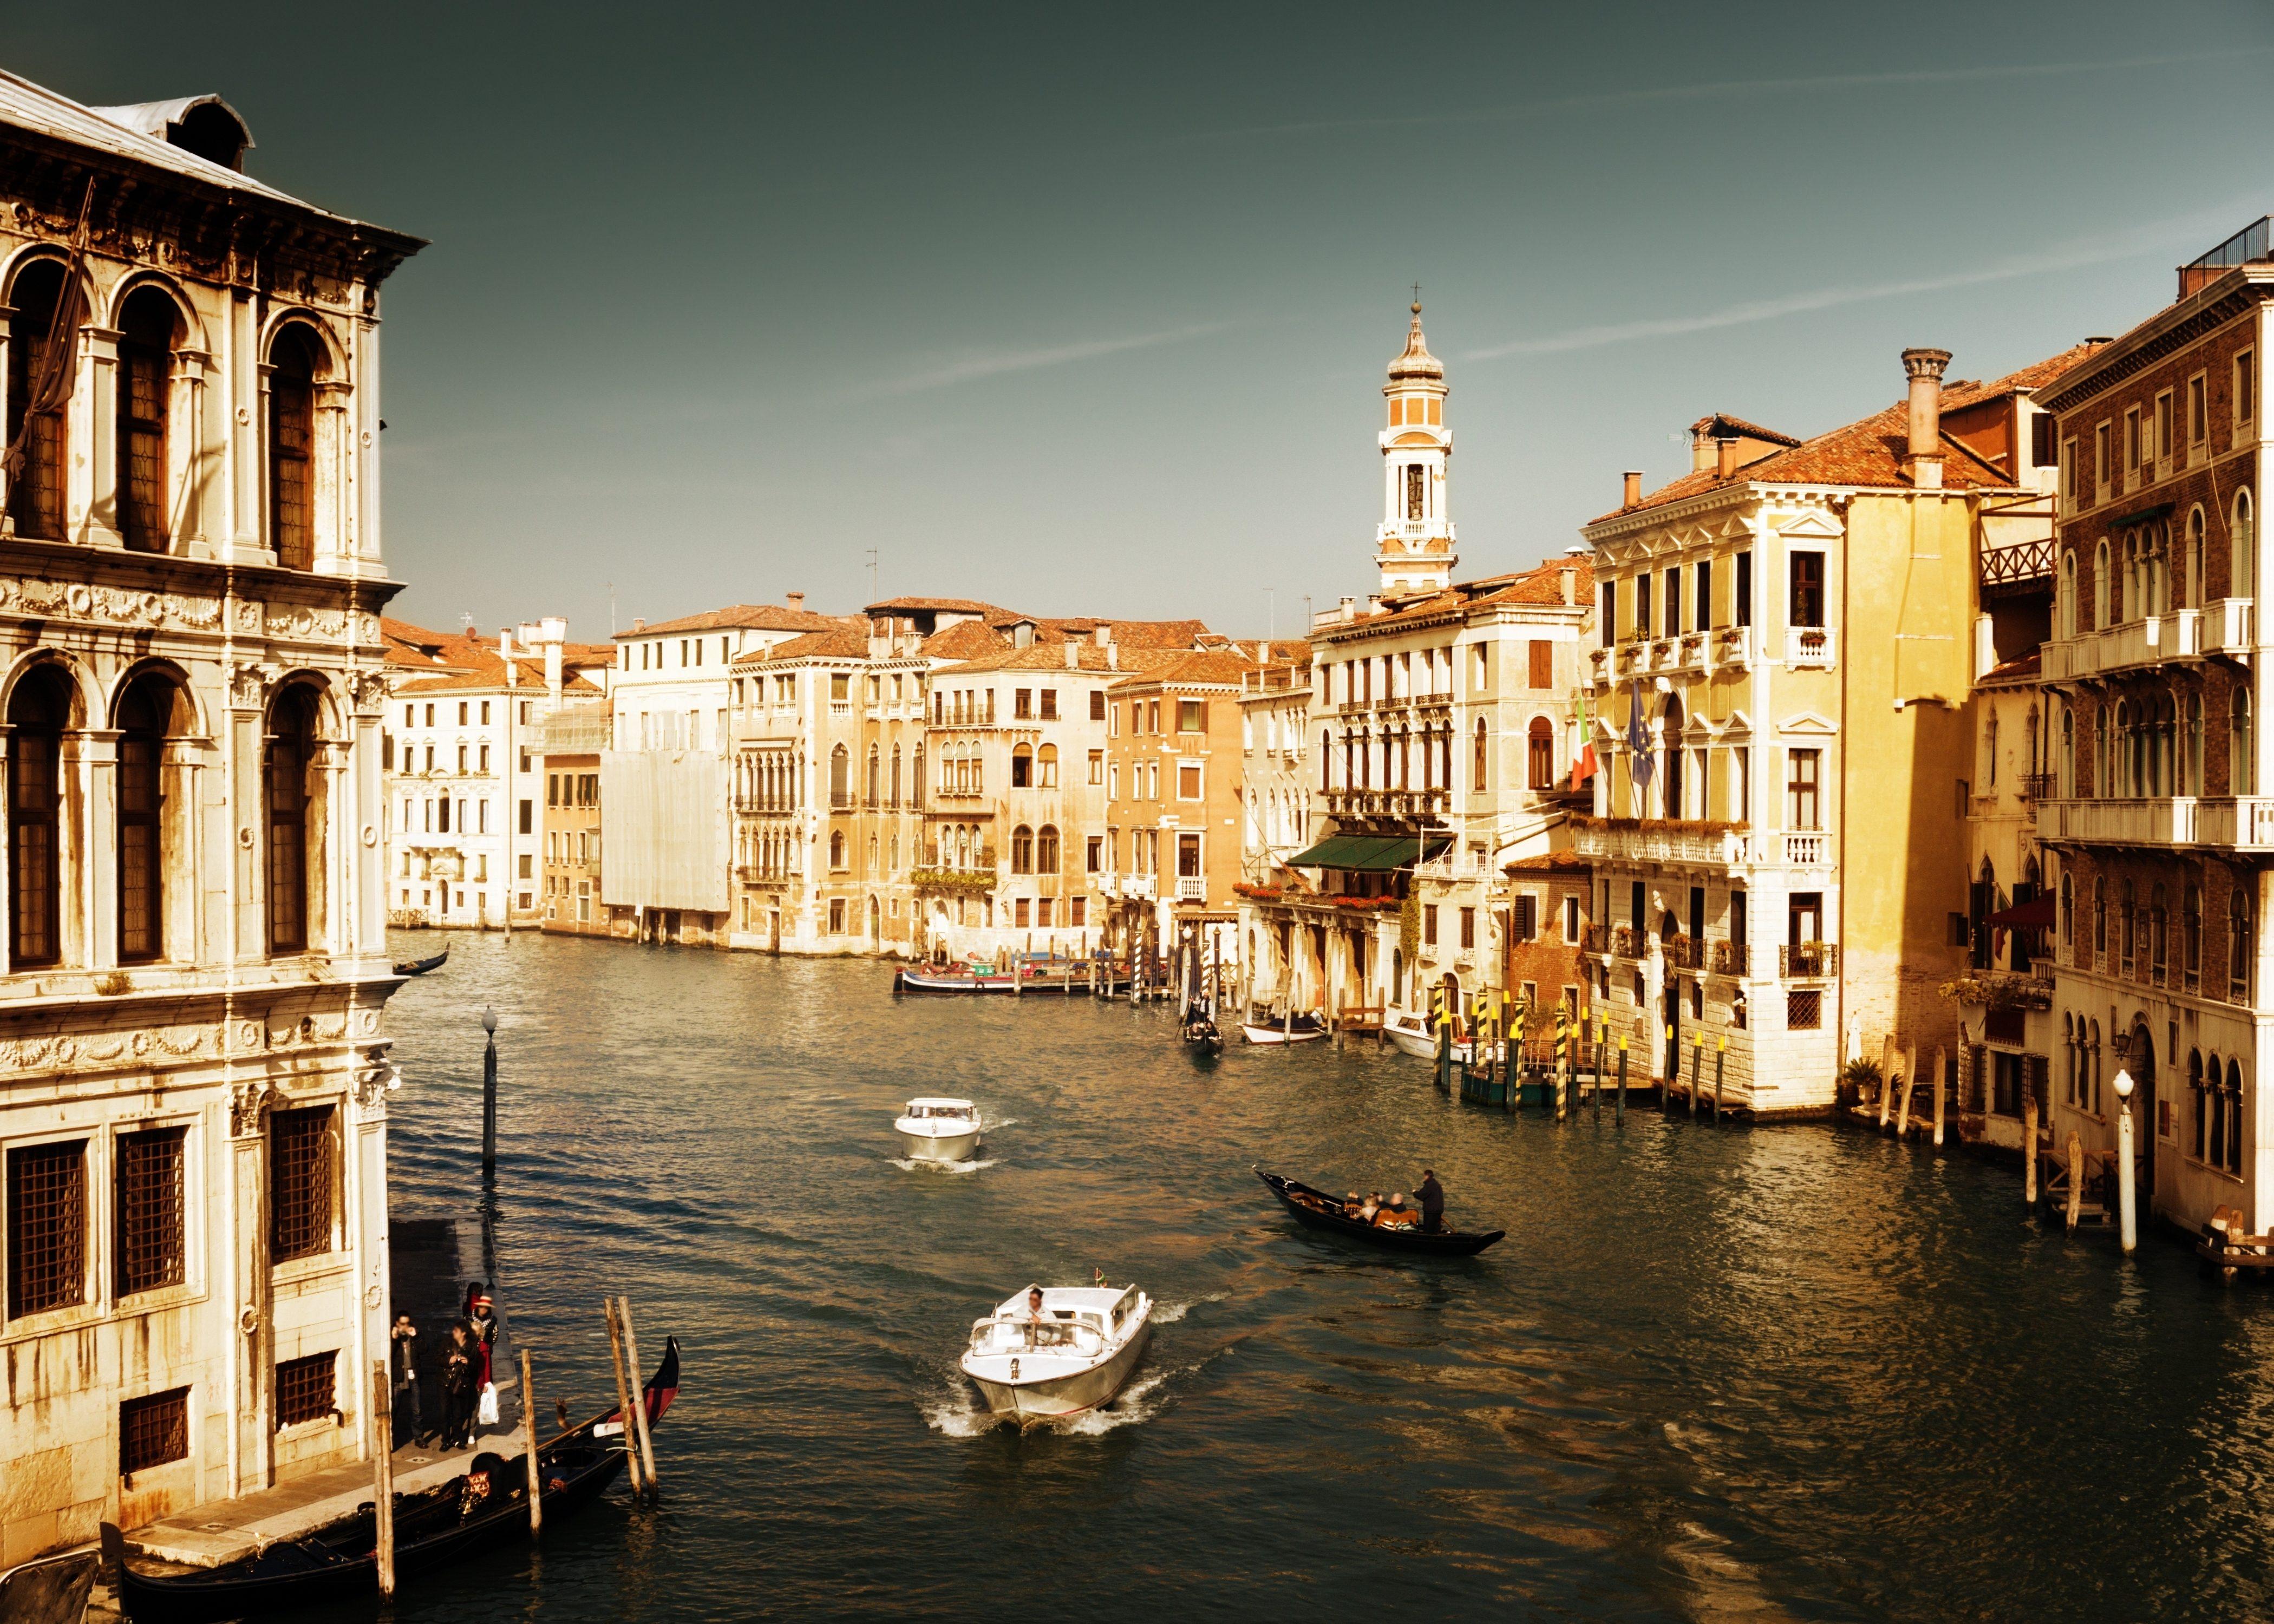 Sunset Over Grand Canal, Venice, Italy  № 1471255 загрузить